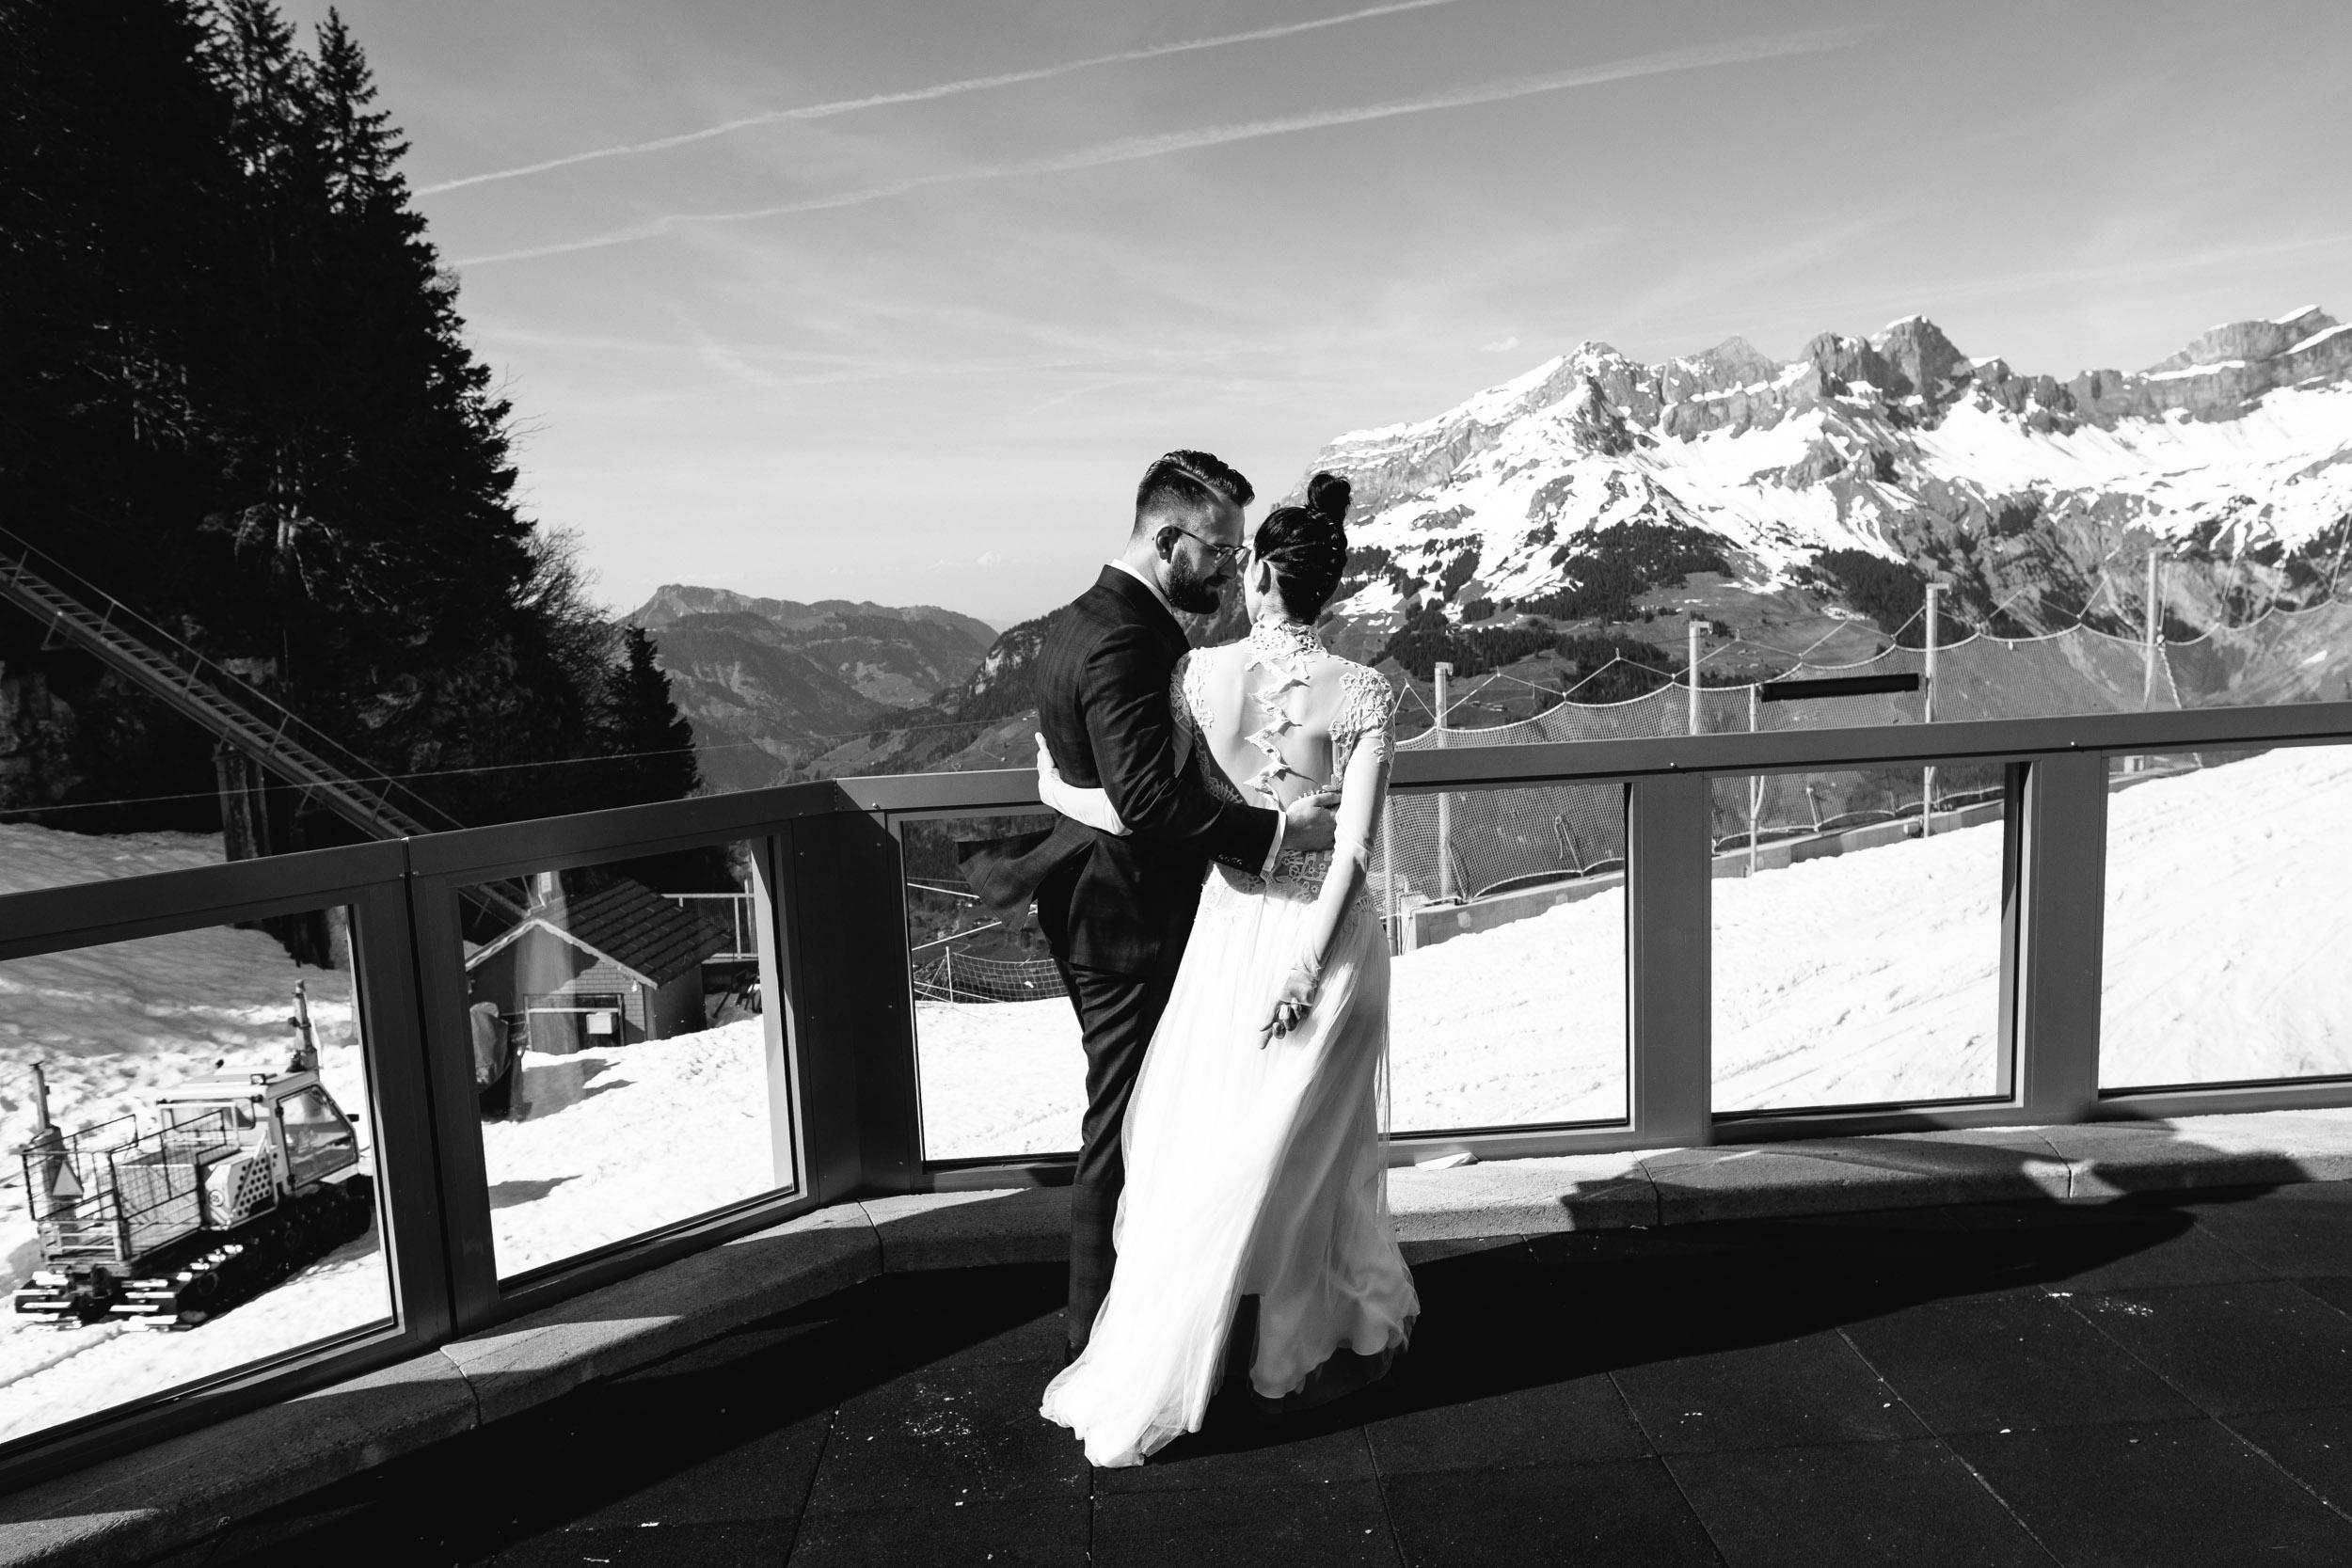 lynn-bastian-switzerland-wedding-photography-83.jpg